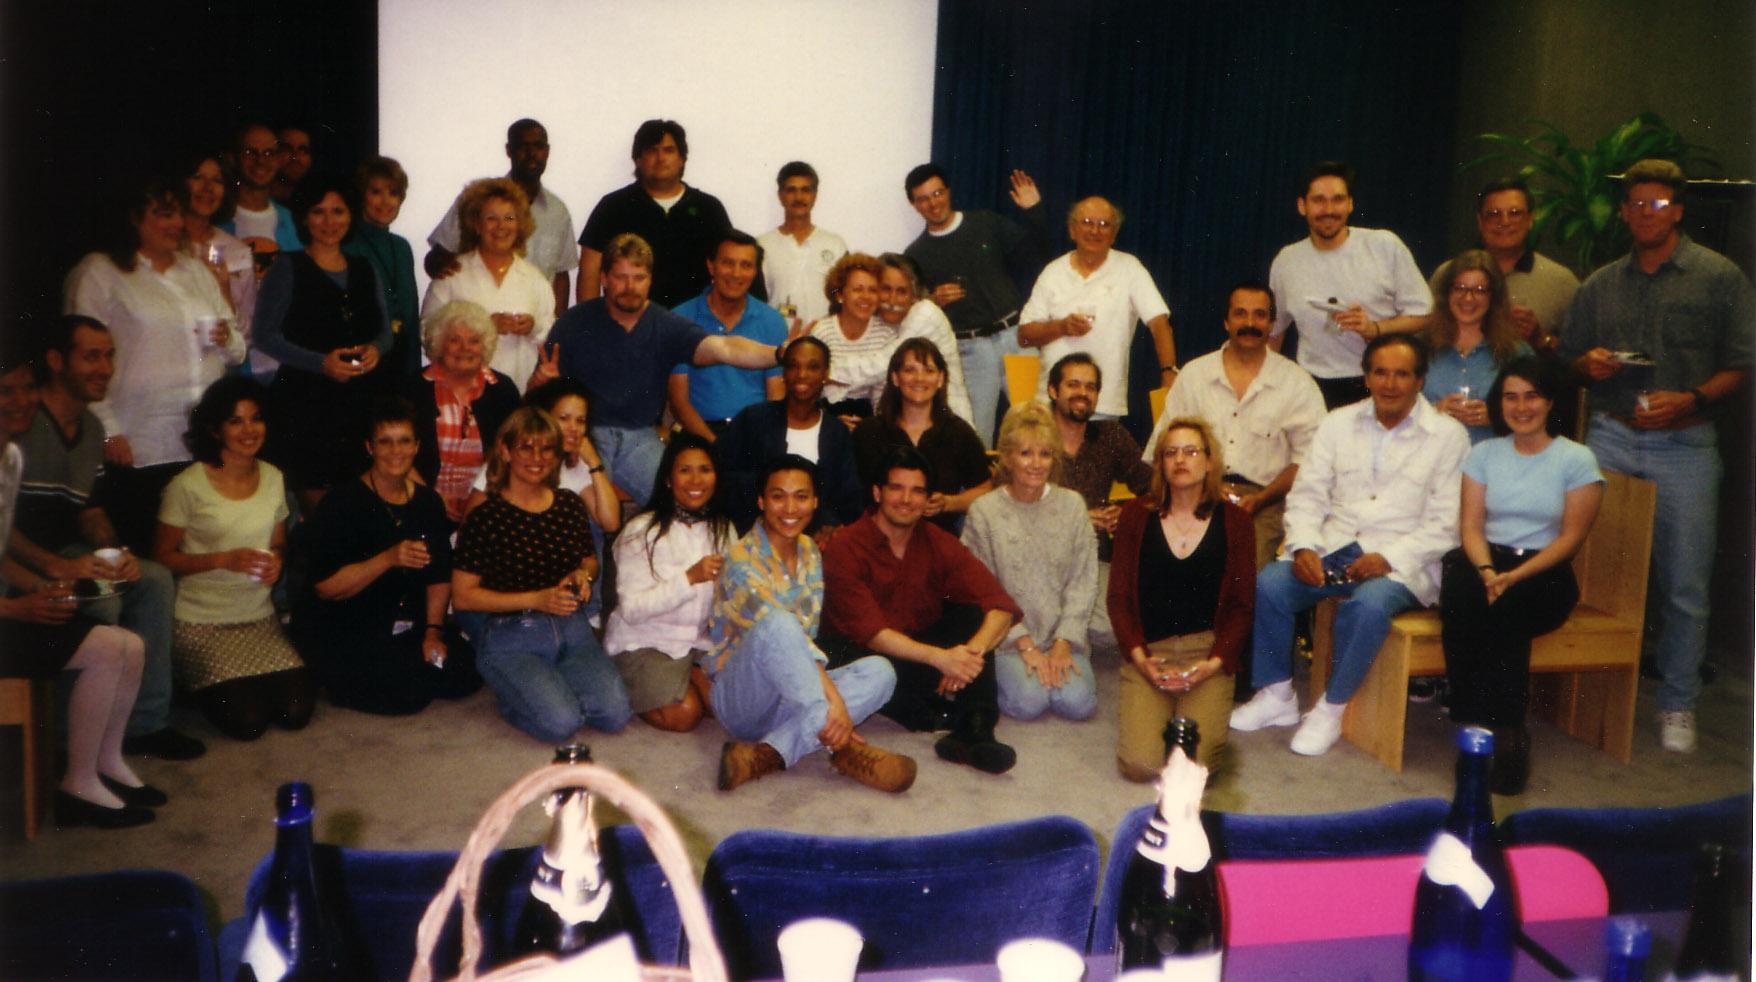 STUDIO ENGAGEMENT PARTY